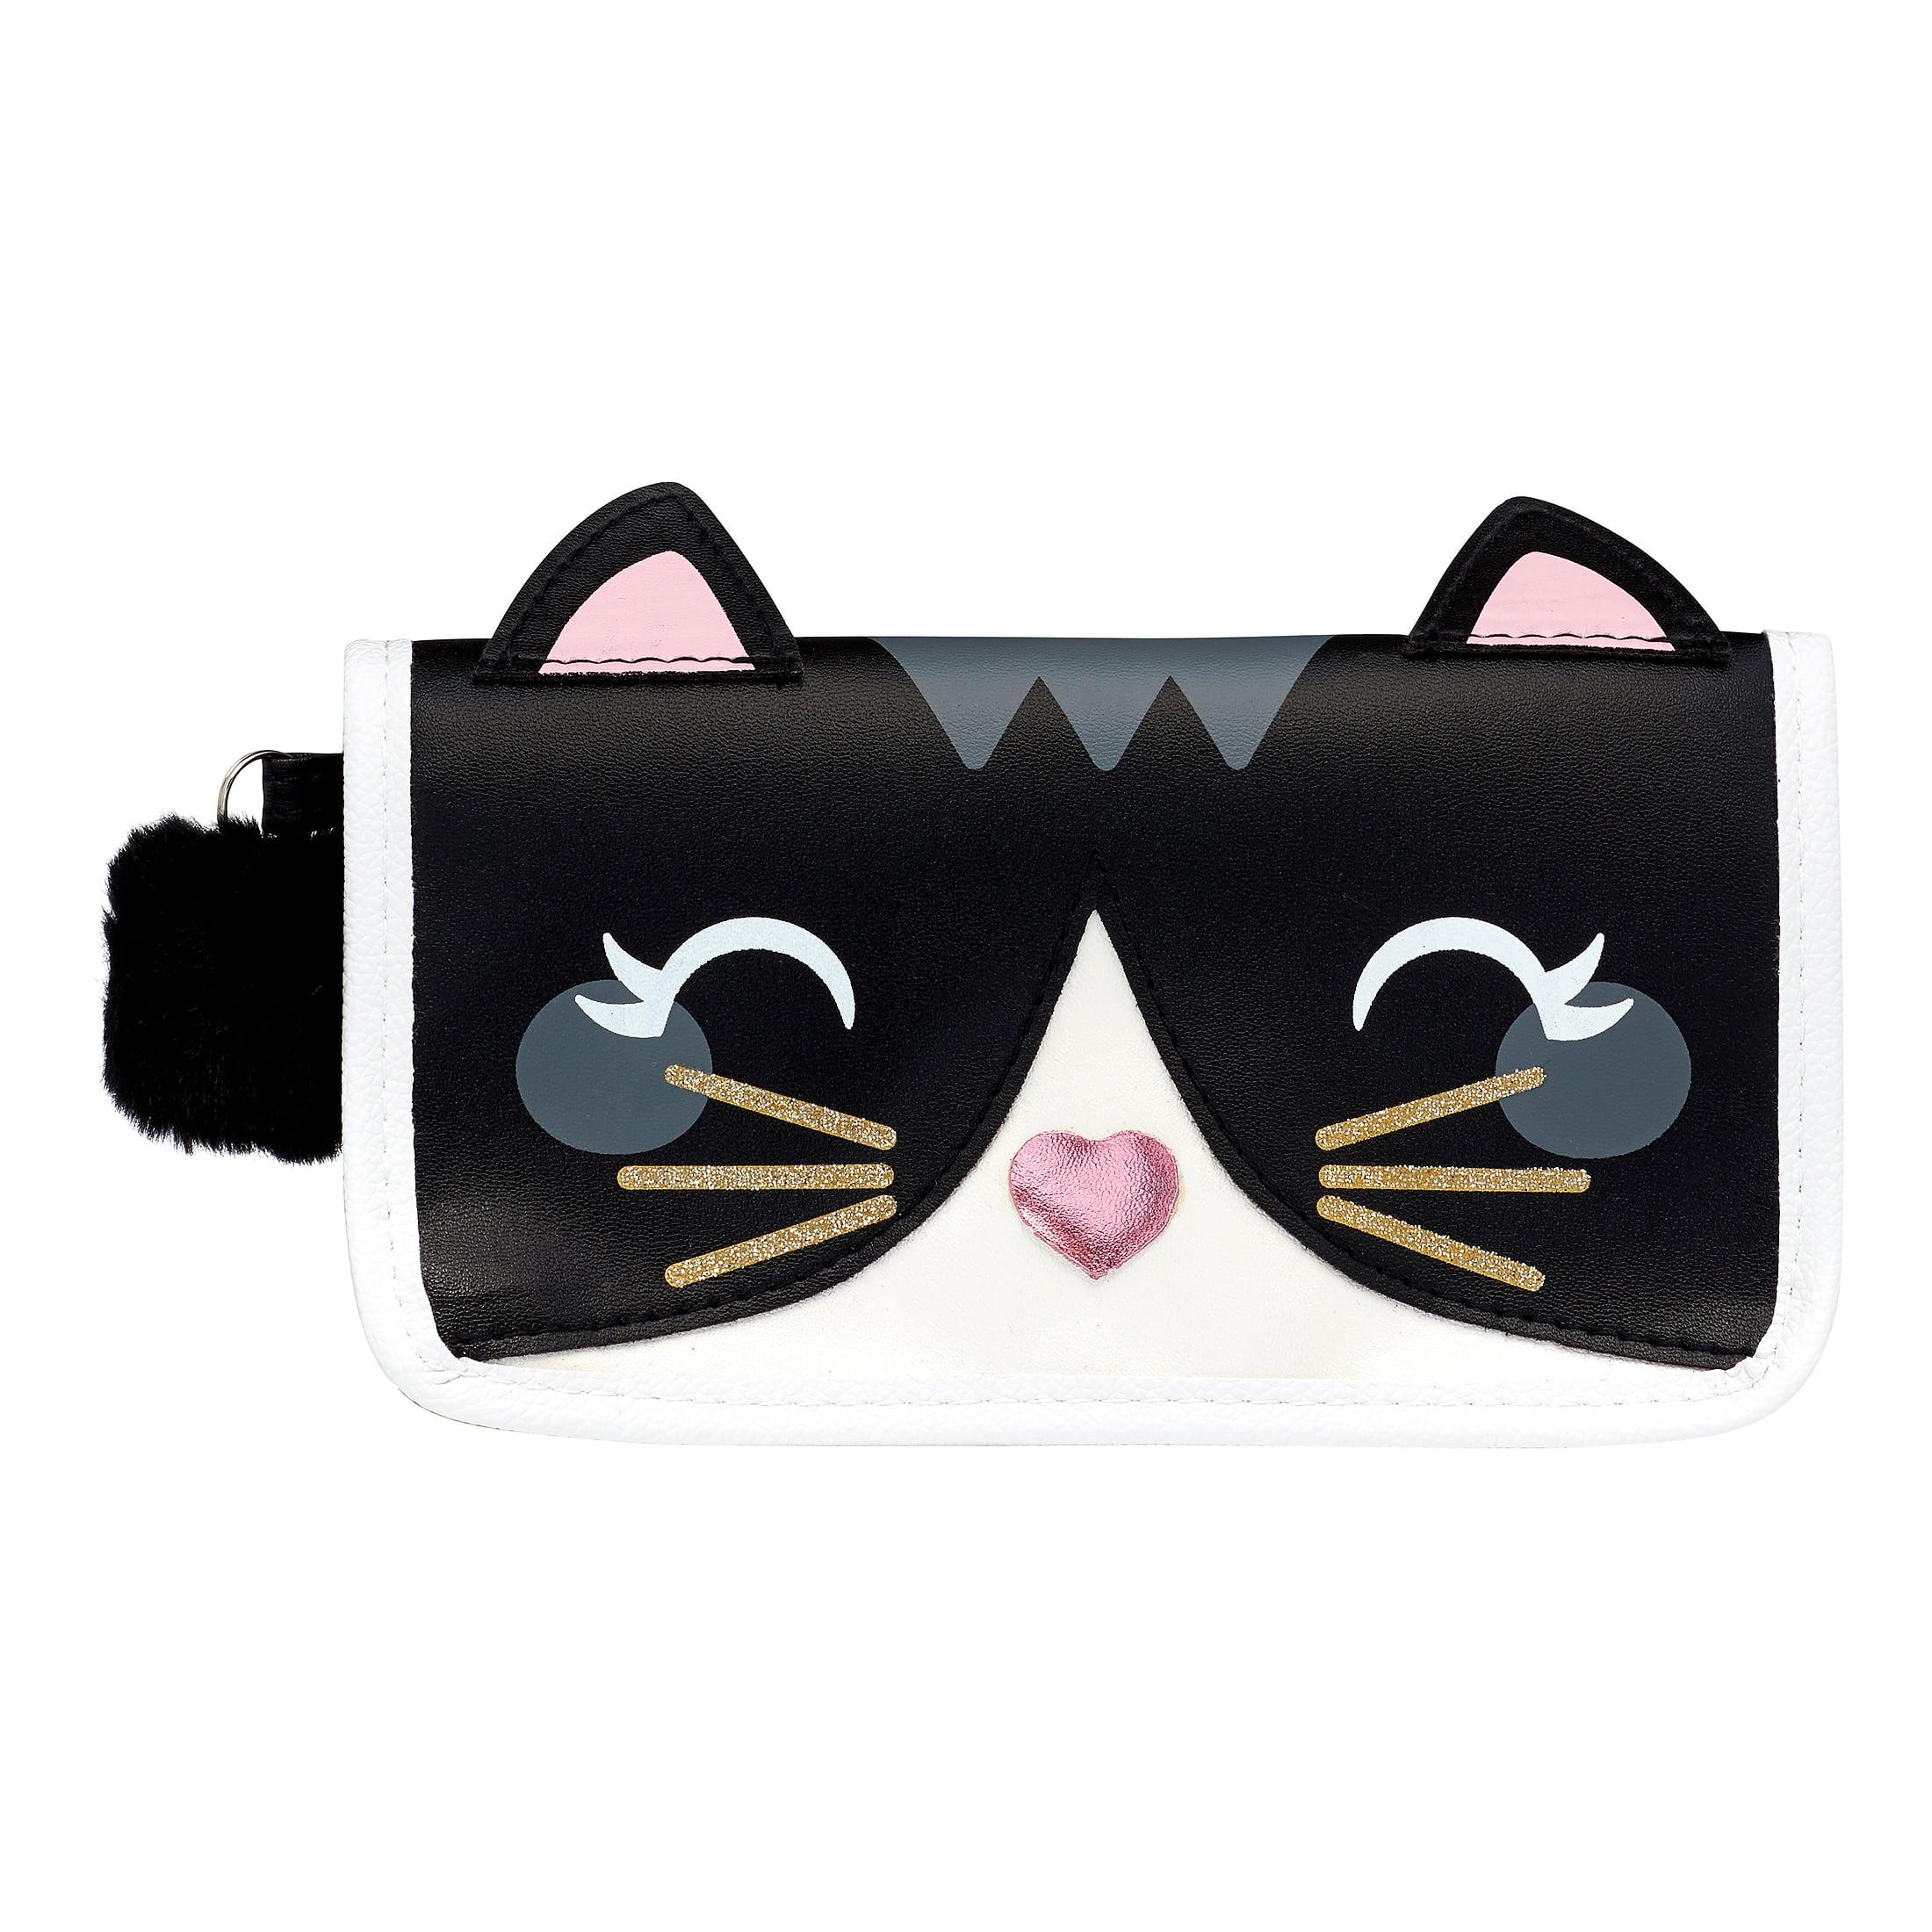 U Style Critter Clutch Bag with Pom Pom, Kitty Cat ($11 Value)